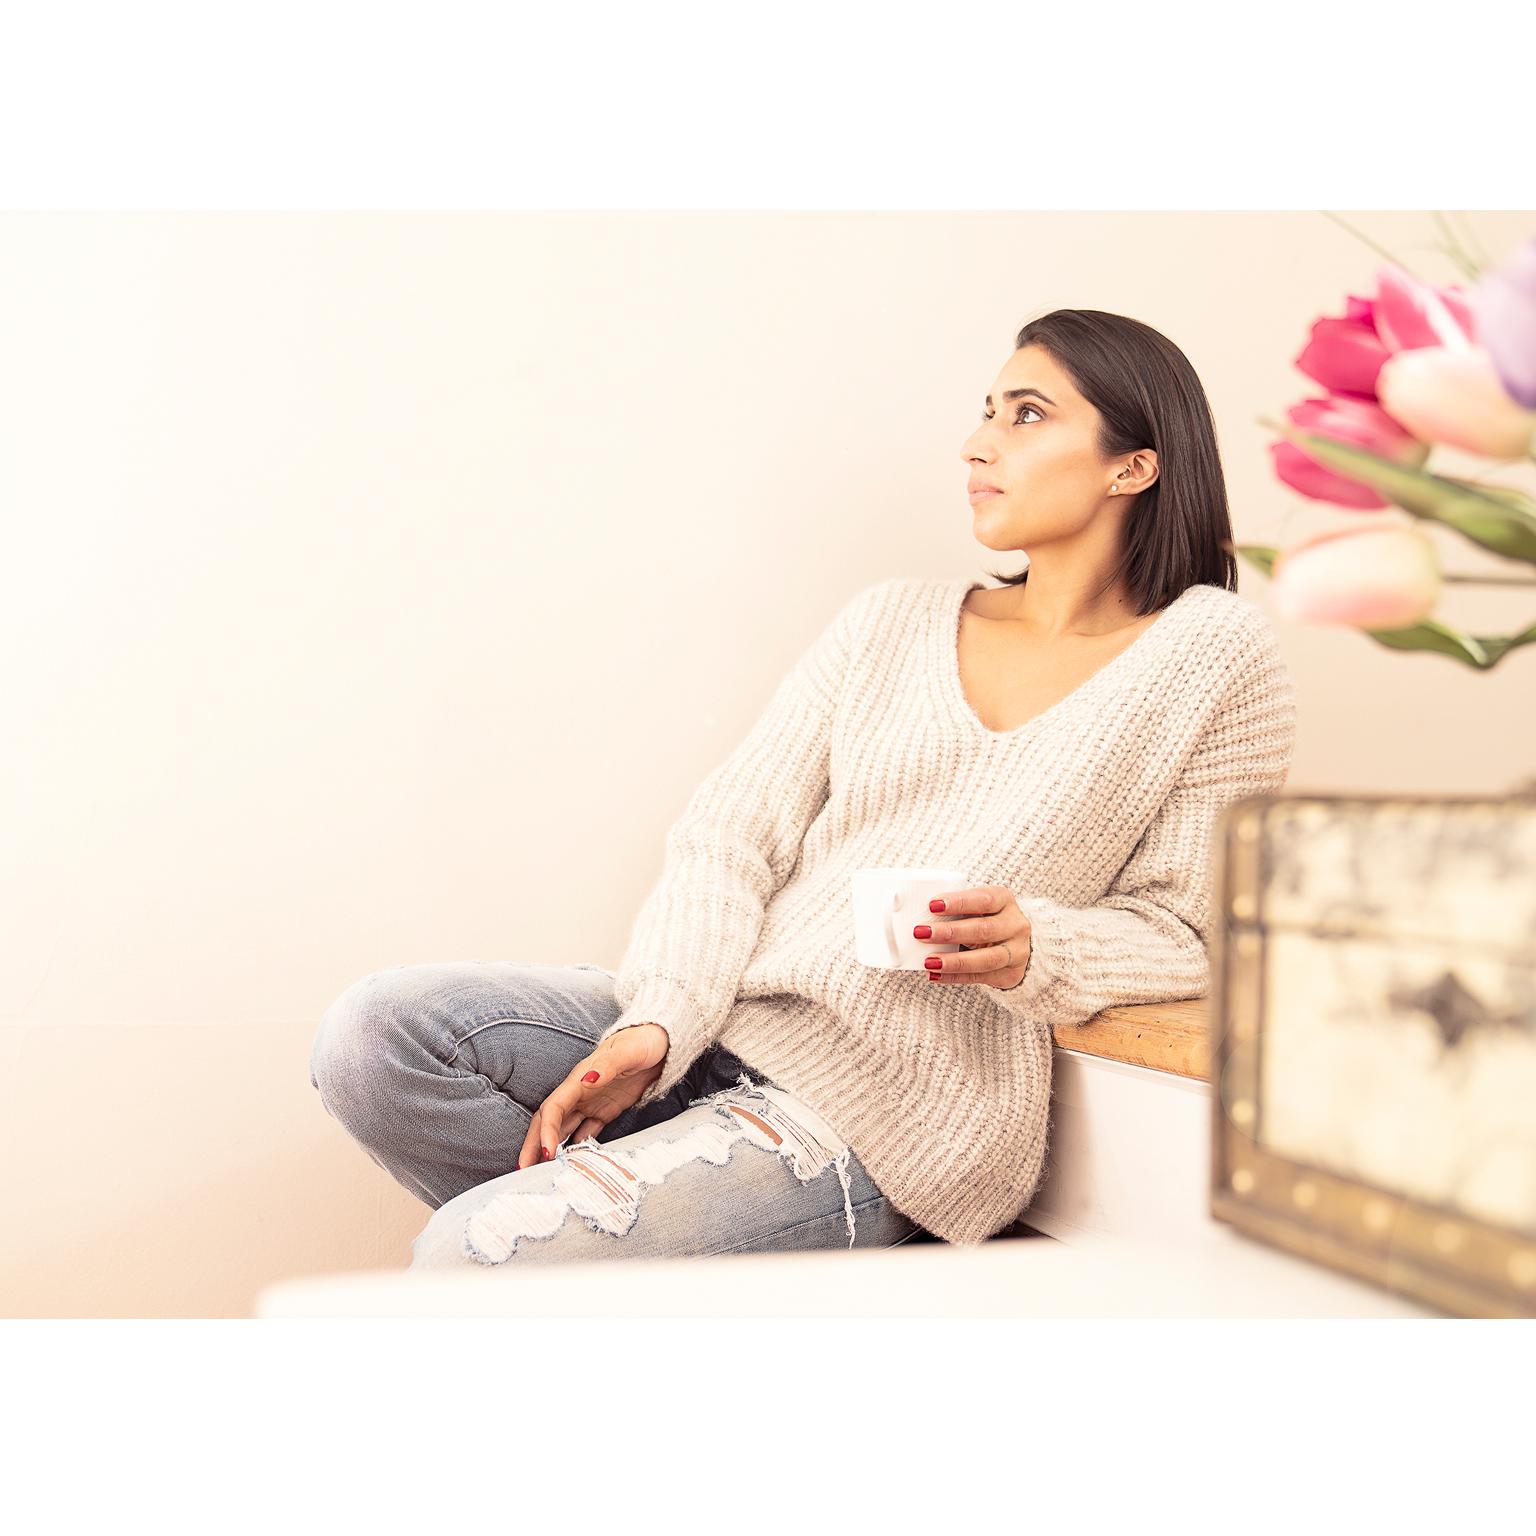 Toronto-Fitness-Model-Agency-Lifestyle-Coffee-Sabrina-Virdee